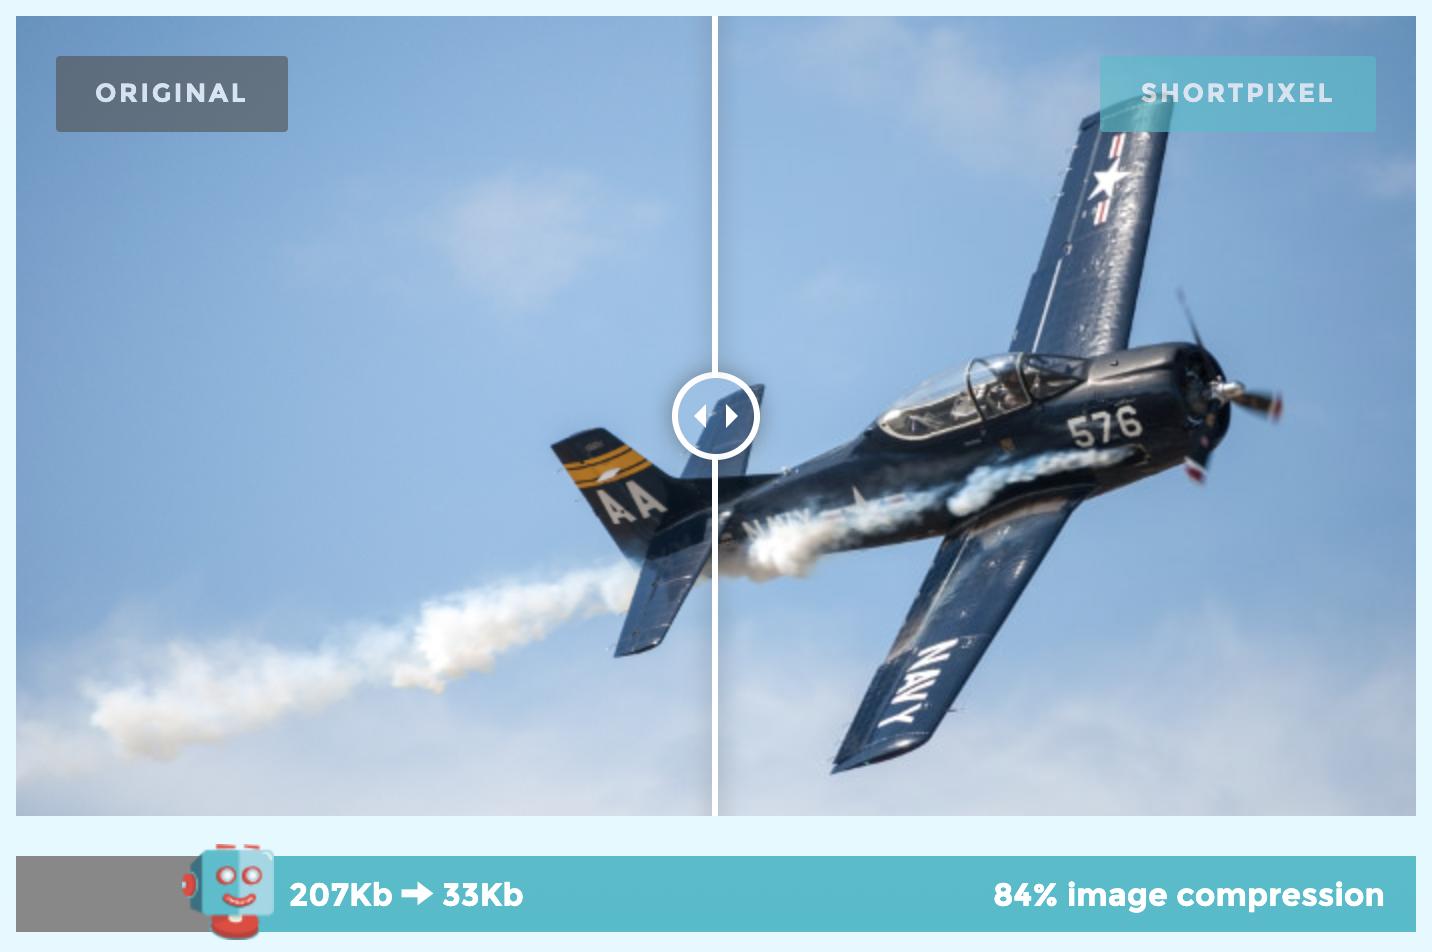 Image Compression Before/After Comparison